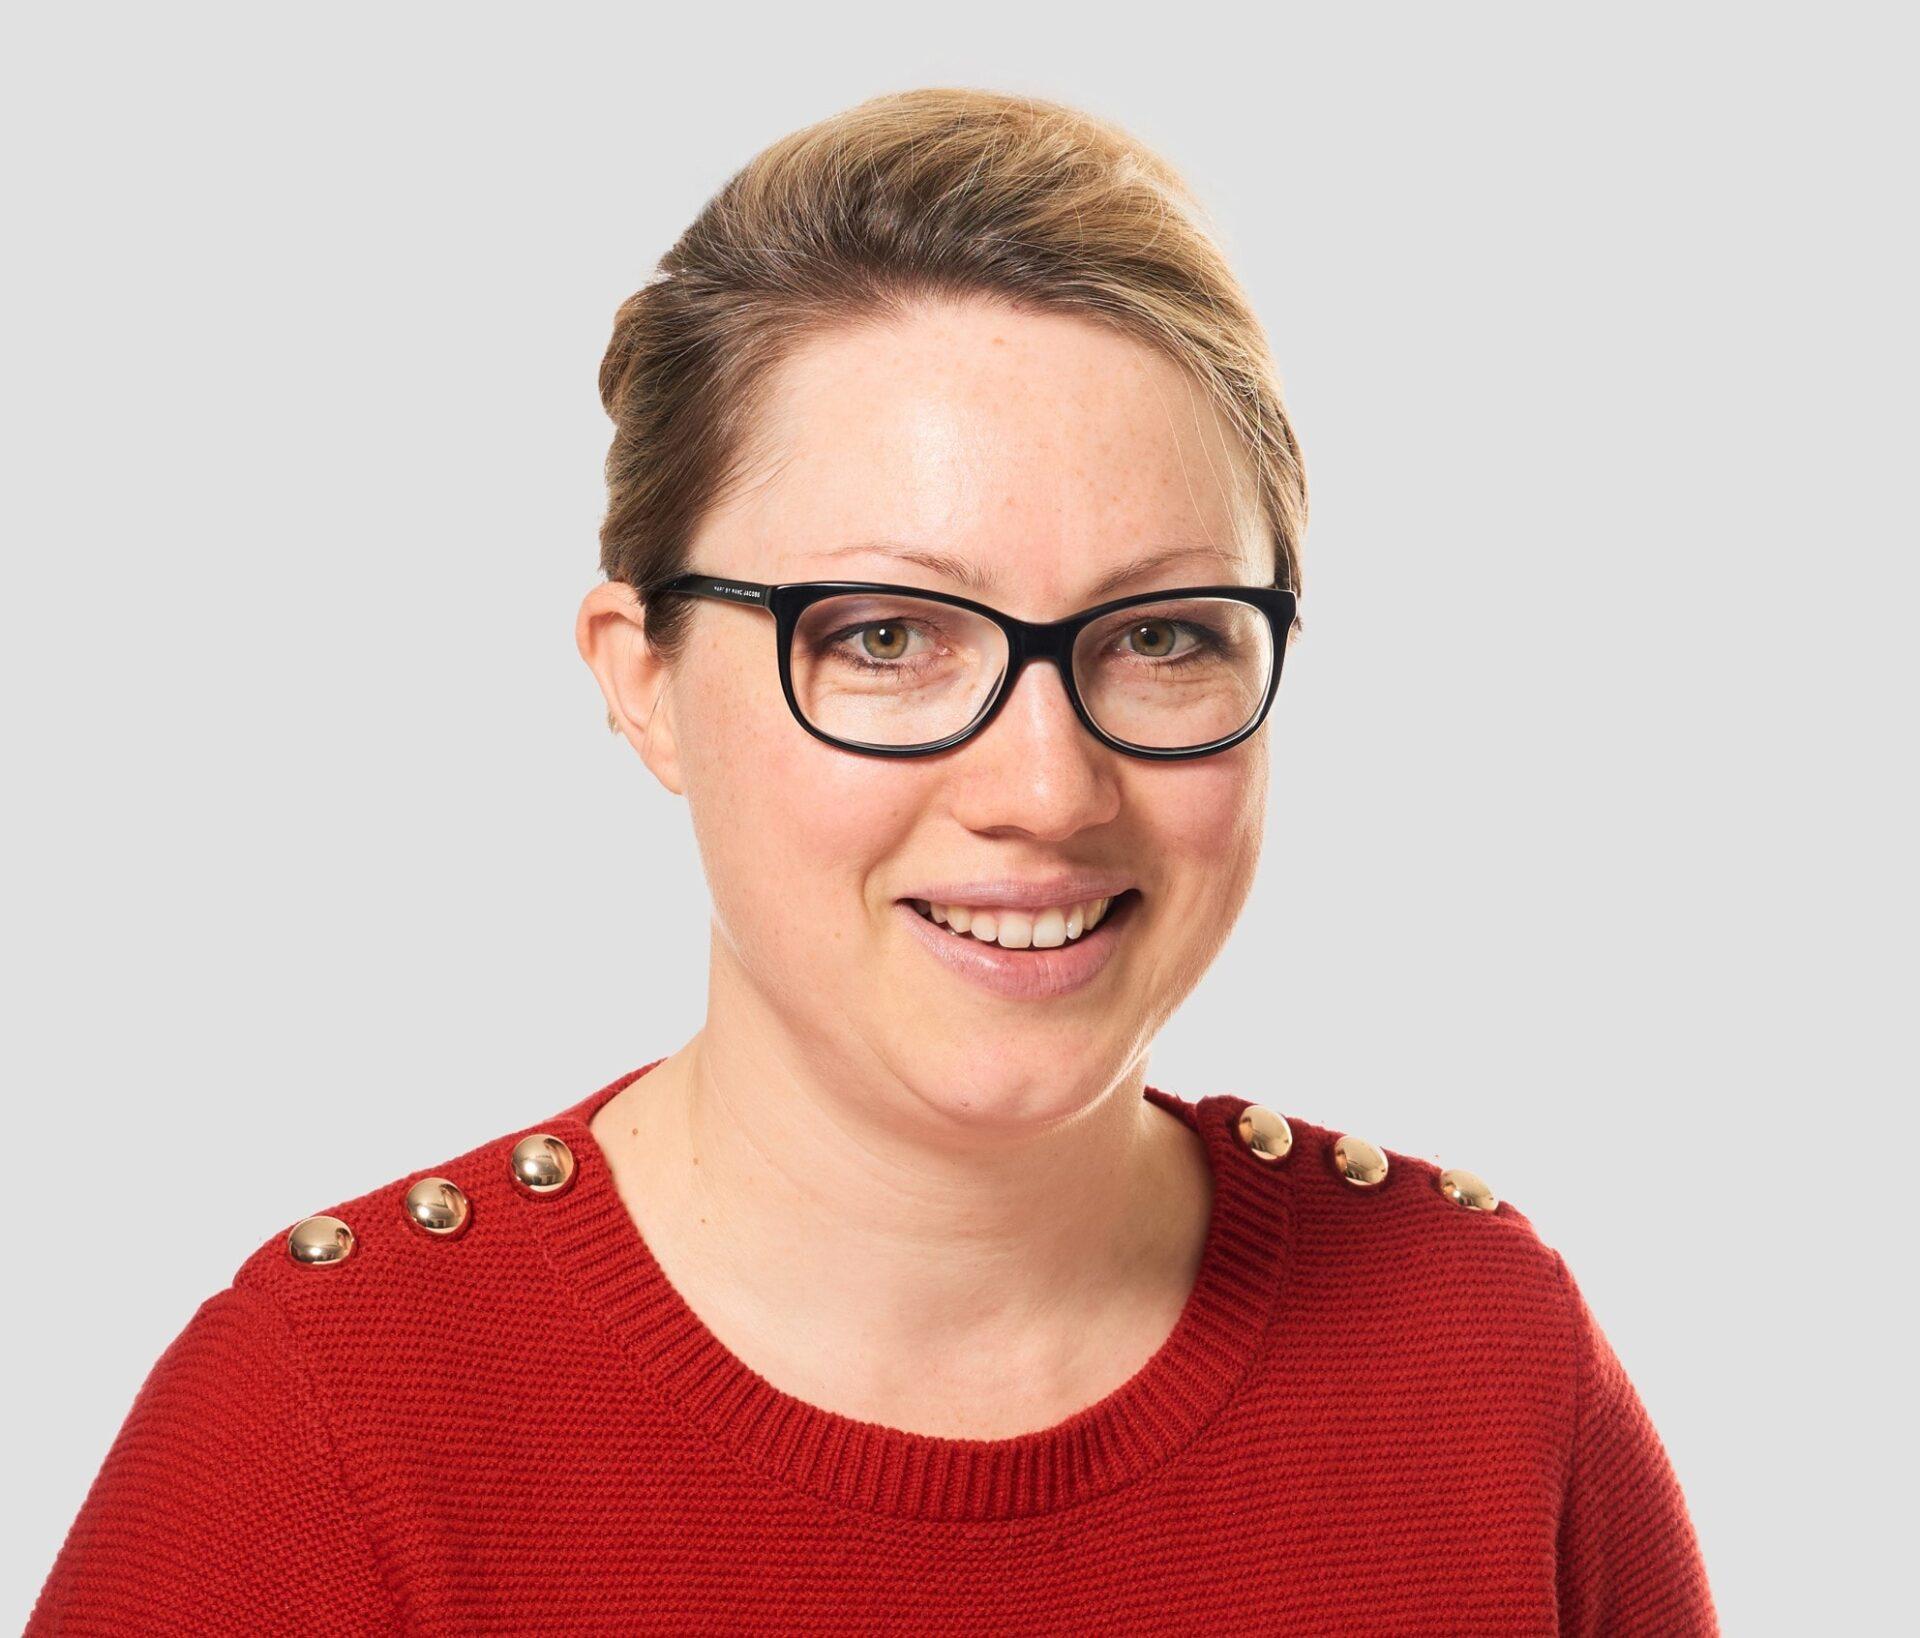 Friederike J. S. Thilo